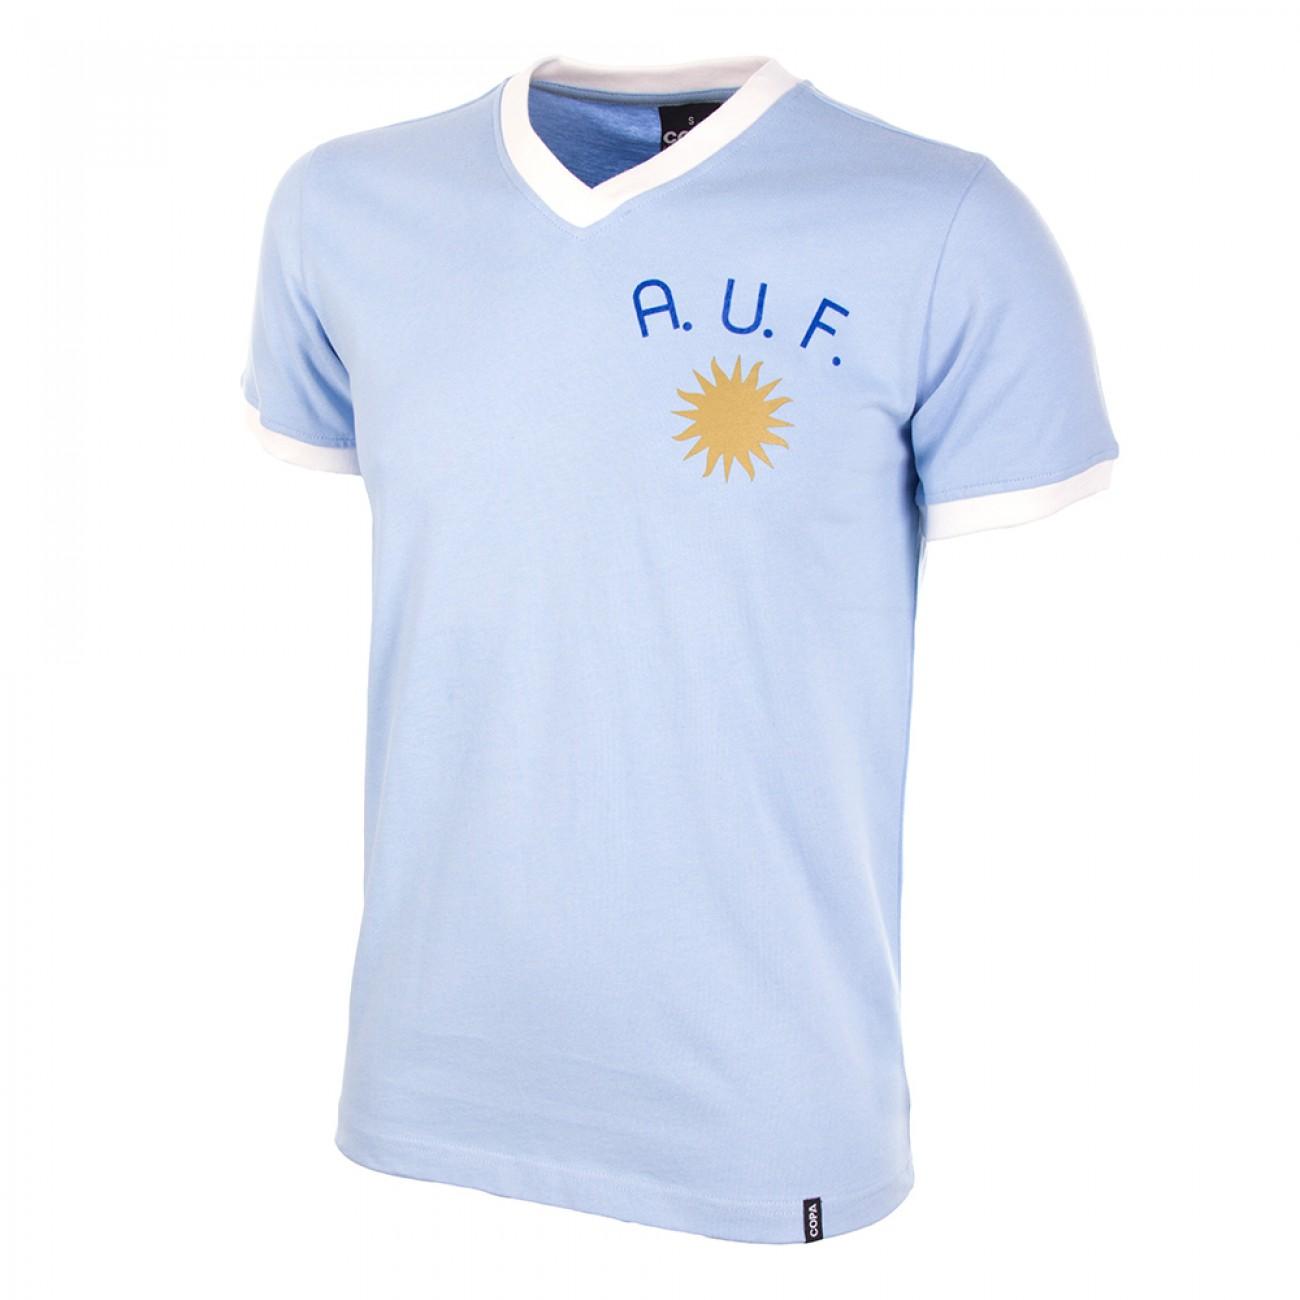 http://www.retrofootball.es/ropa-de-futbol/camiseta-uruguay-a-os-70.html